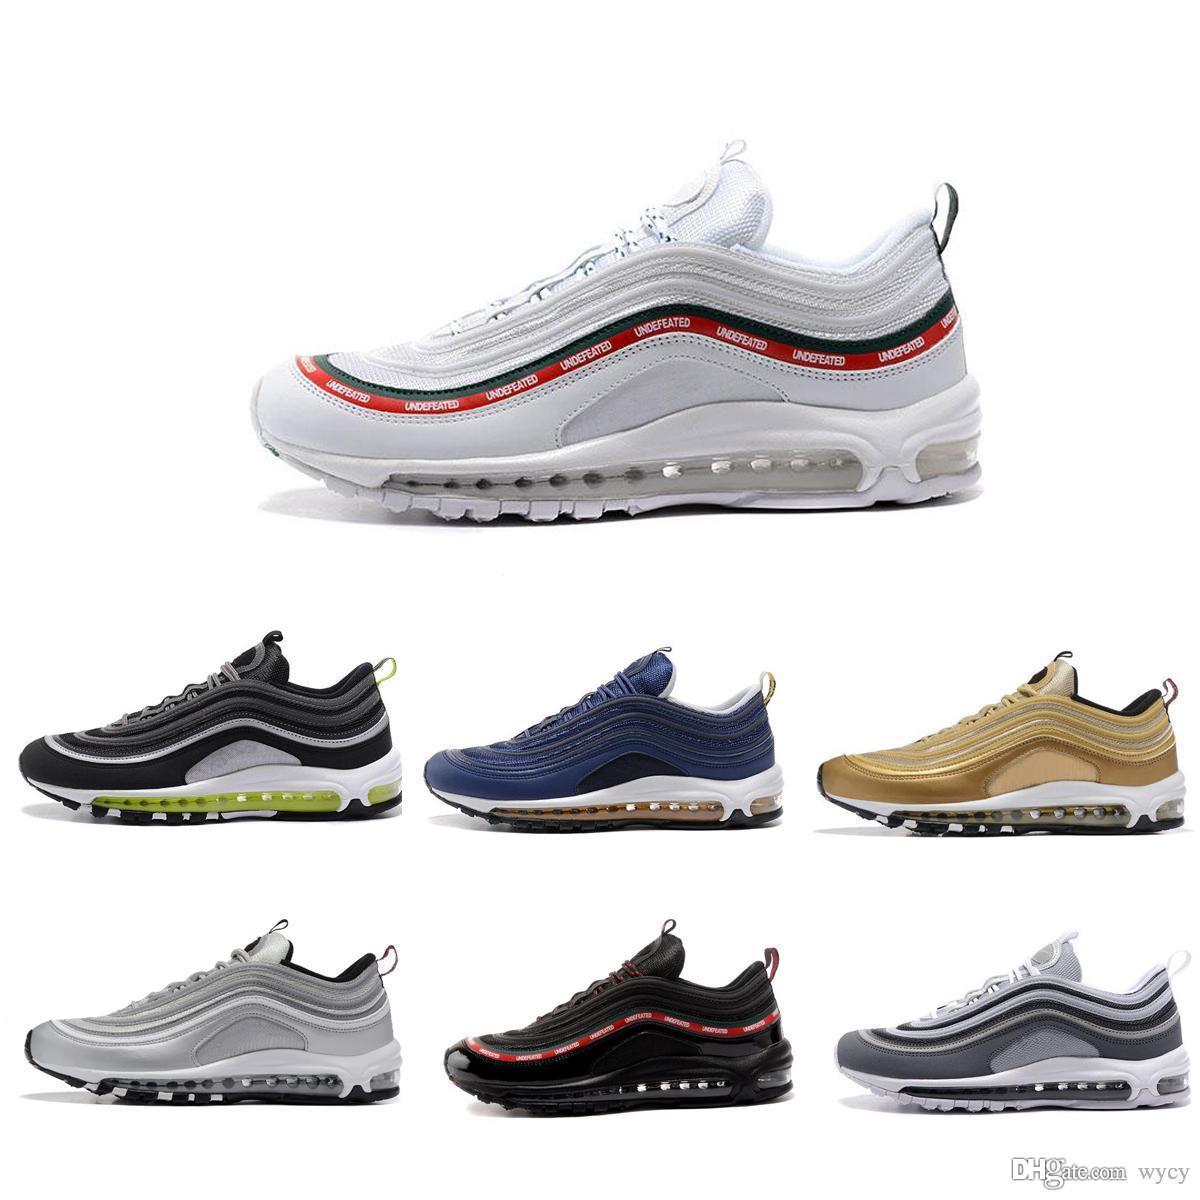 Réduire Simple Nike Air Max 97 Hommes Qualité Nike De Gros